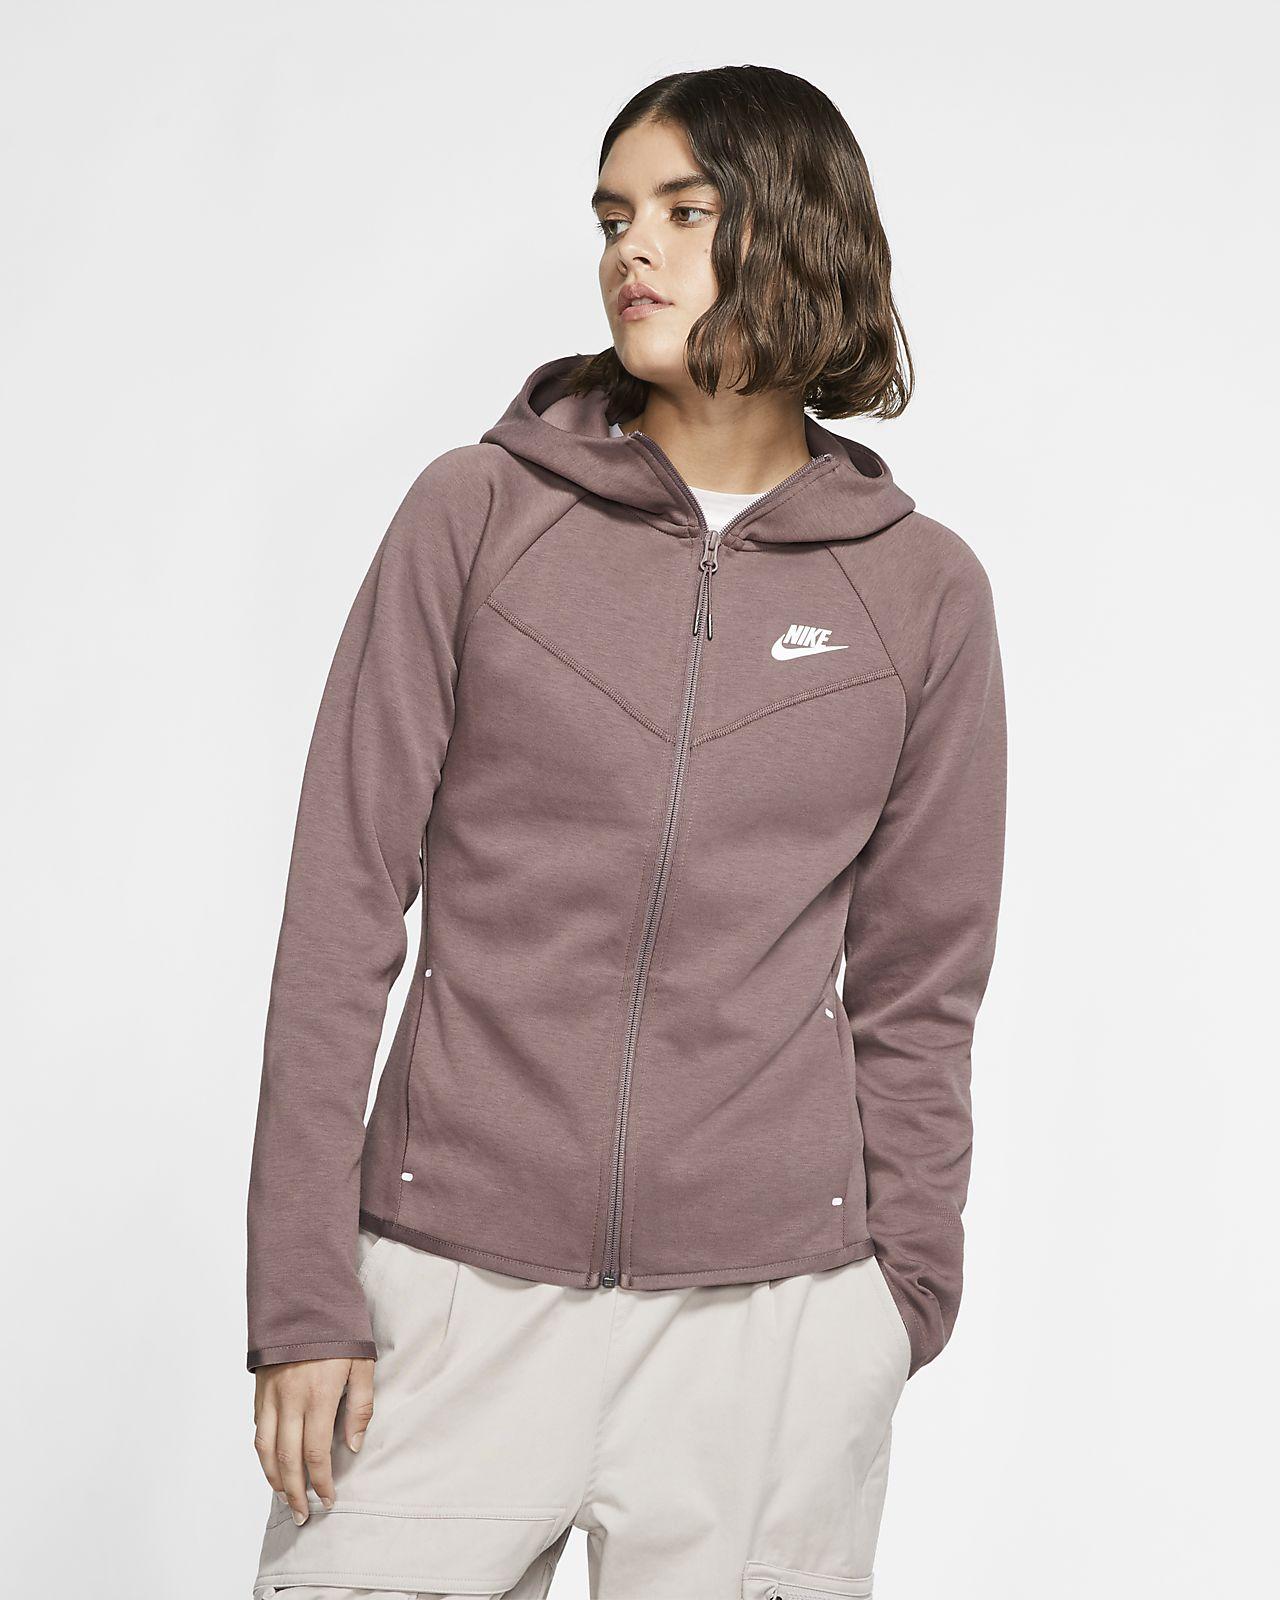 Nike Sportswear Windrunner Tech Fleece Dessuadora amb caputxa i cremallera completa - Dona